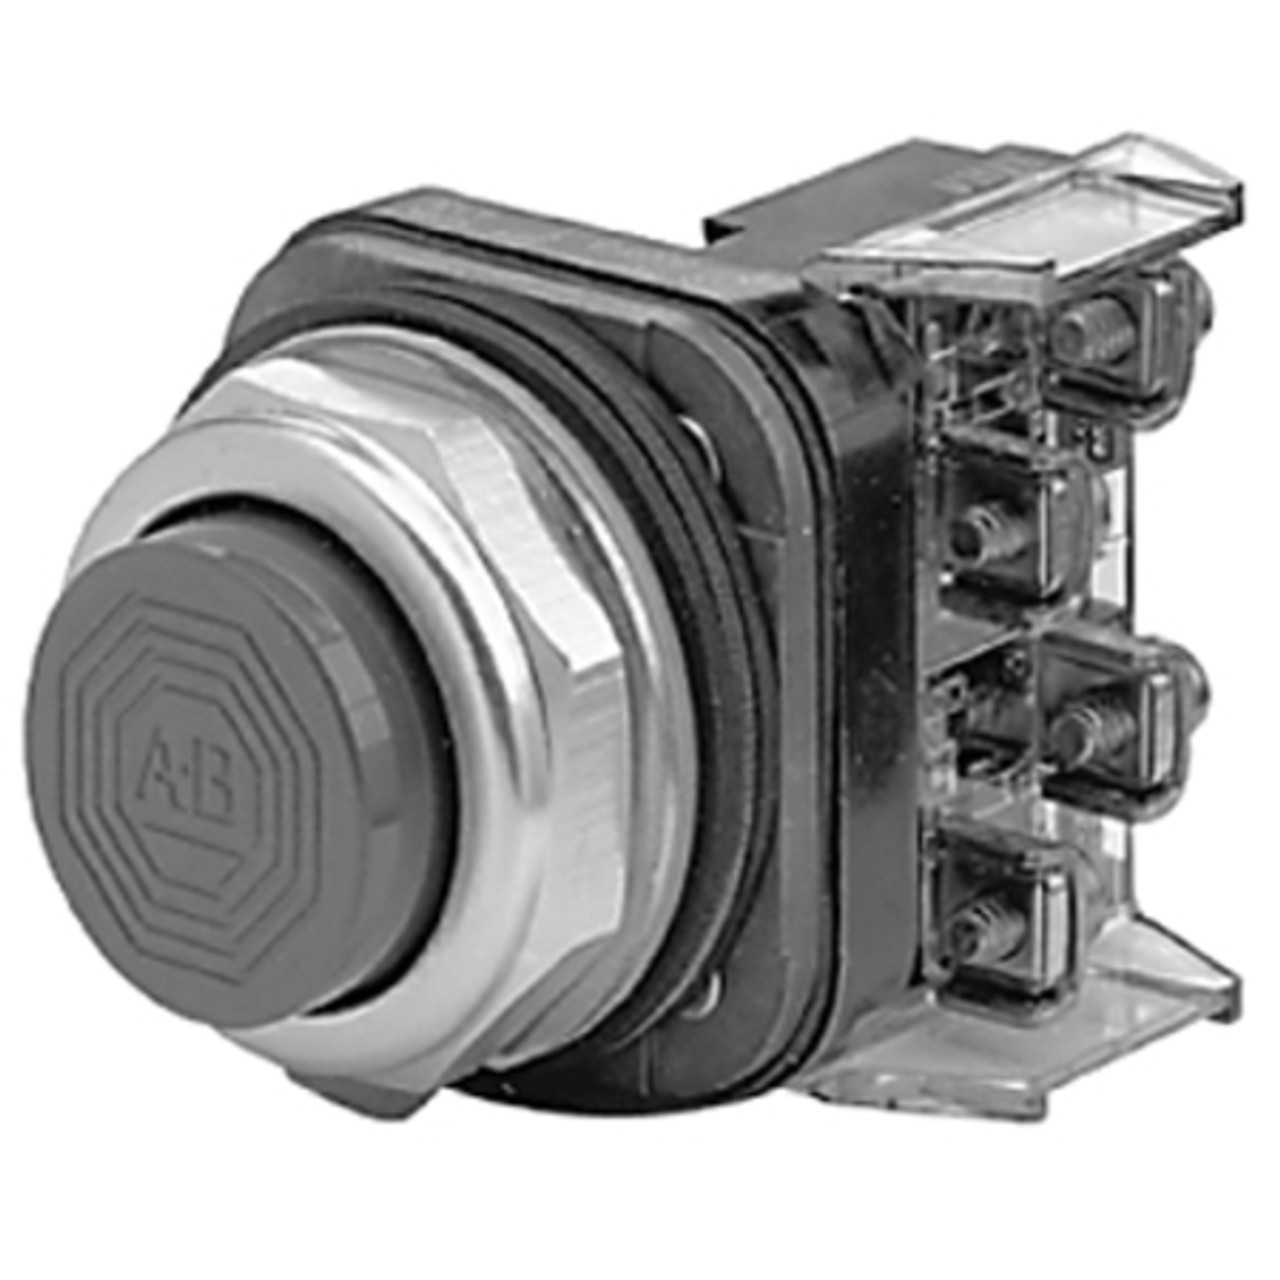 Allen Bradley 800T-B2D1 Series T Push Button